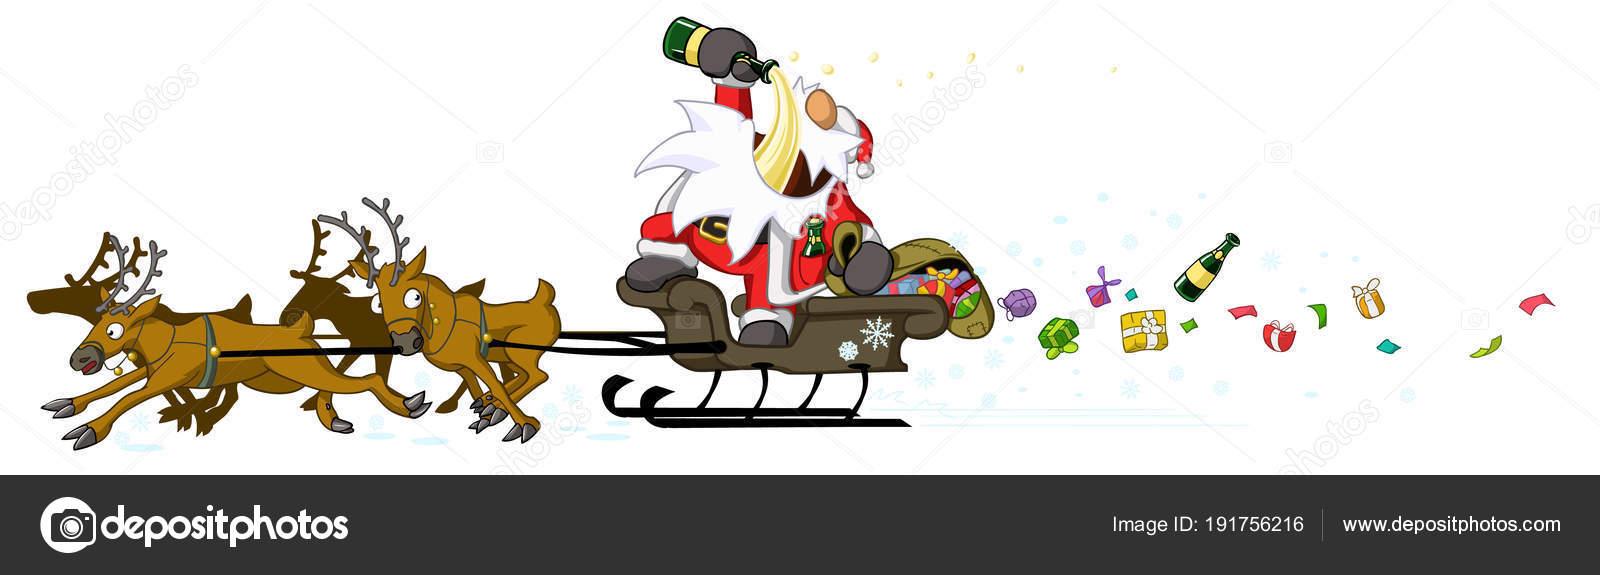 Party Christmas Cartoon Drunk Driving Stock Vector C Higyou 191756216